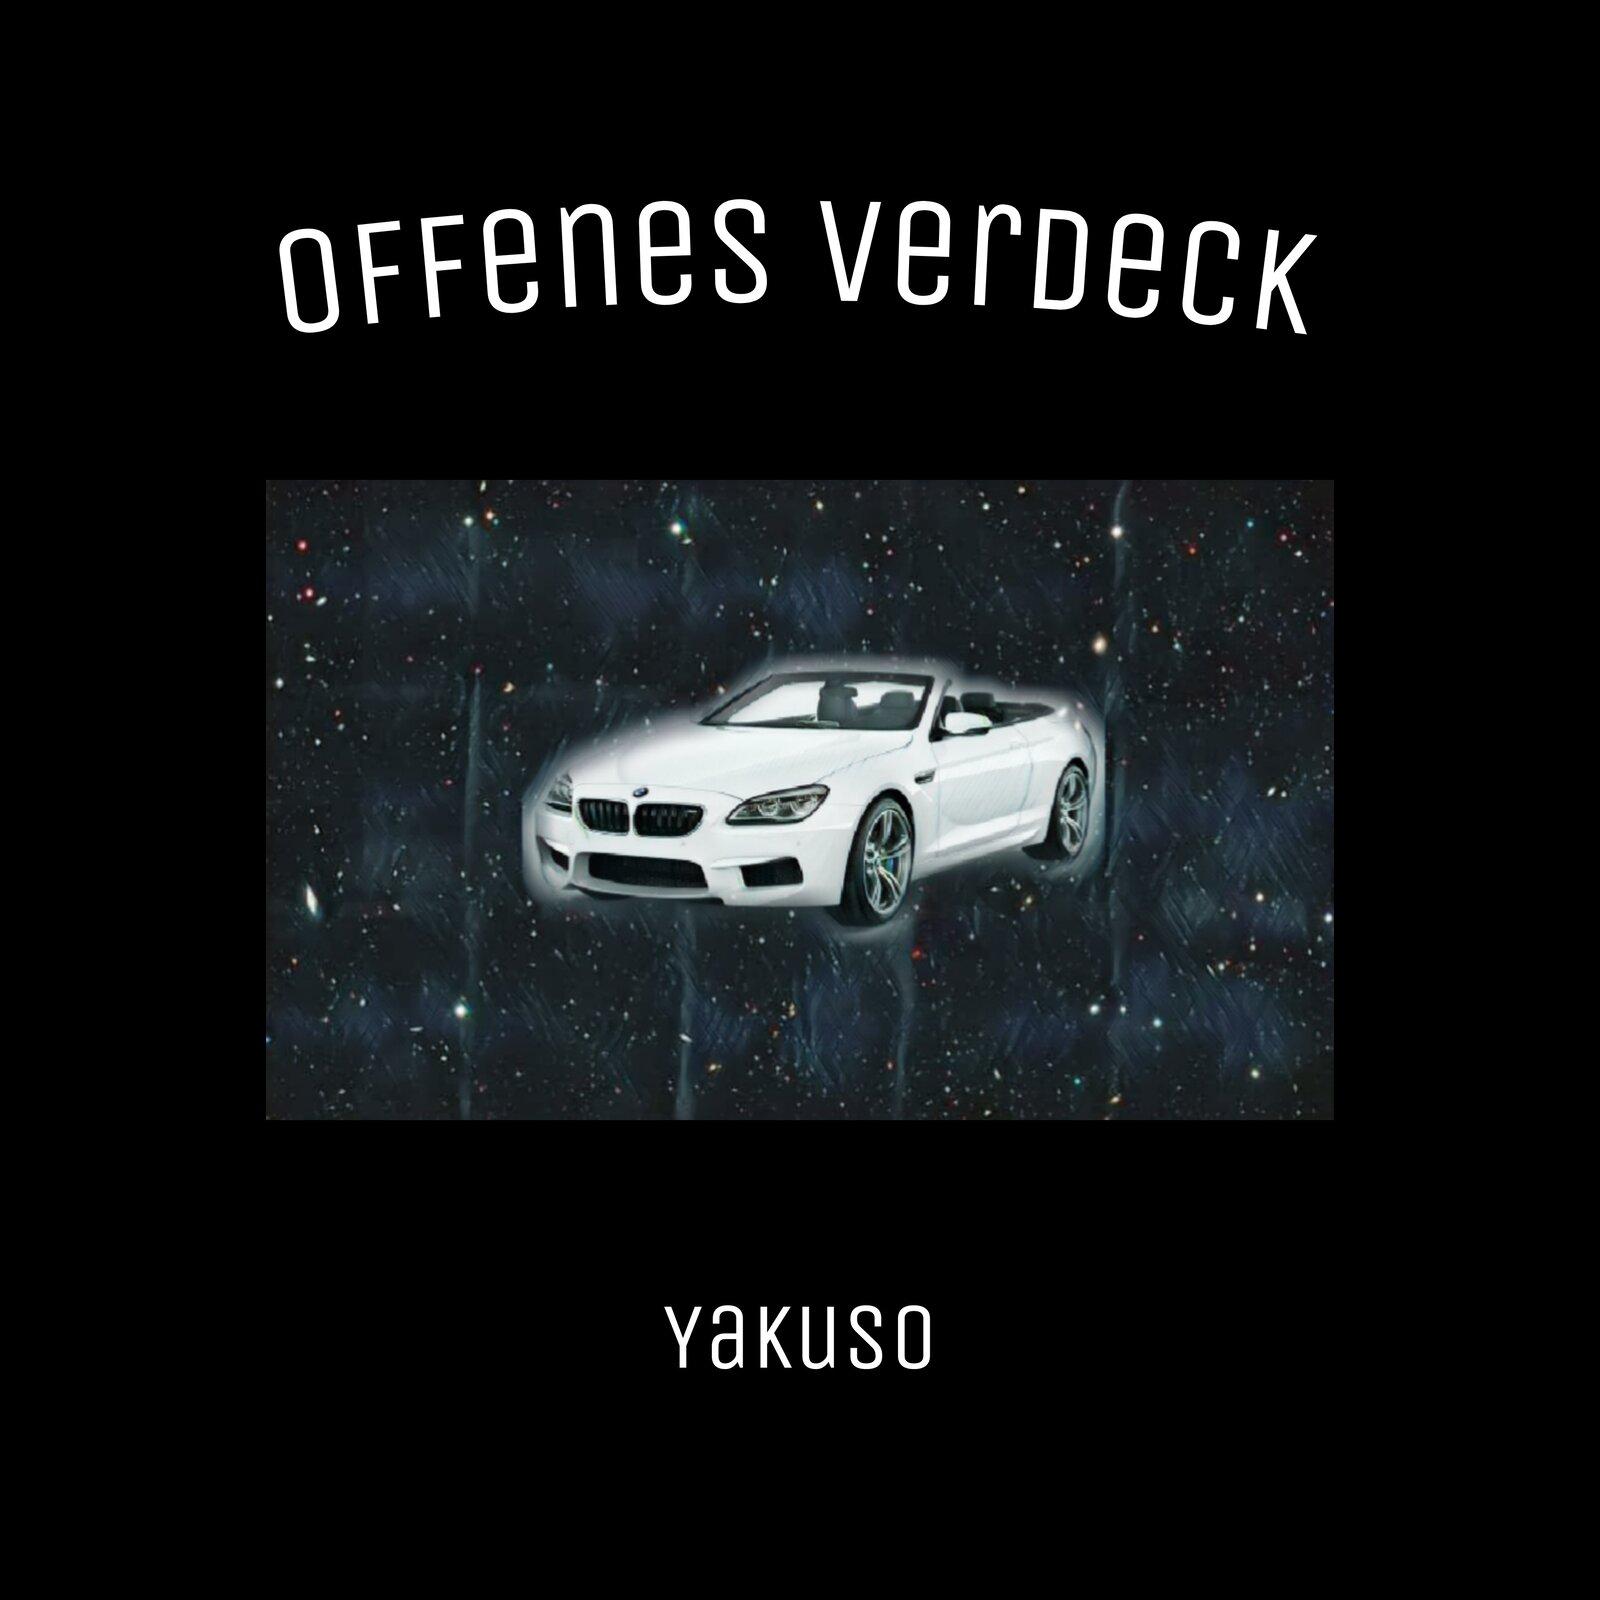 Upcoming: Yakuso - Offenes Verdeck